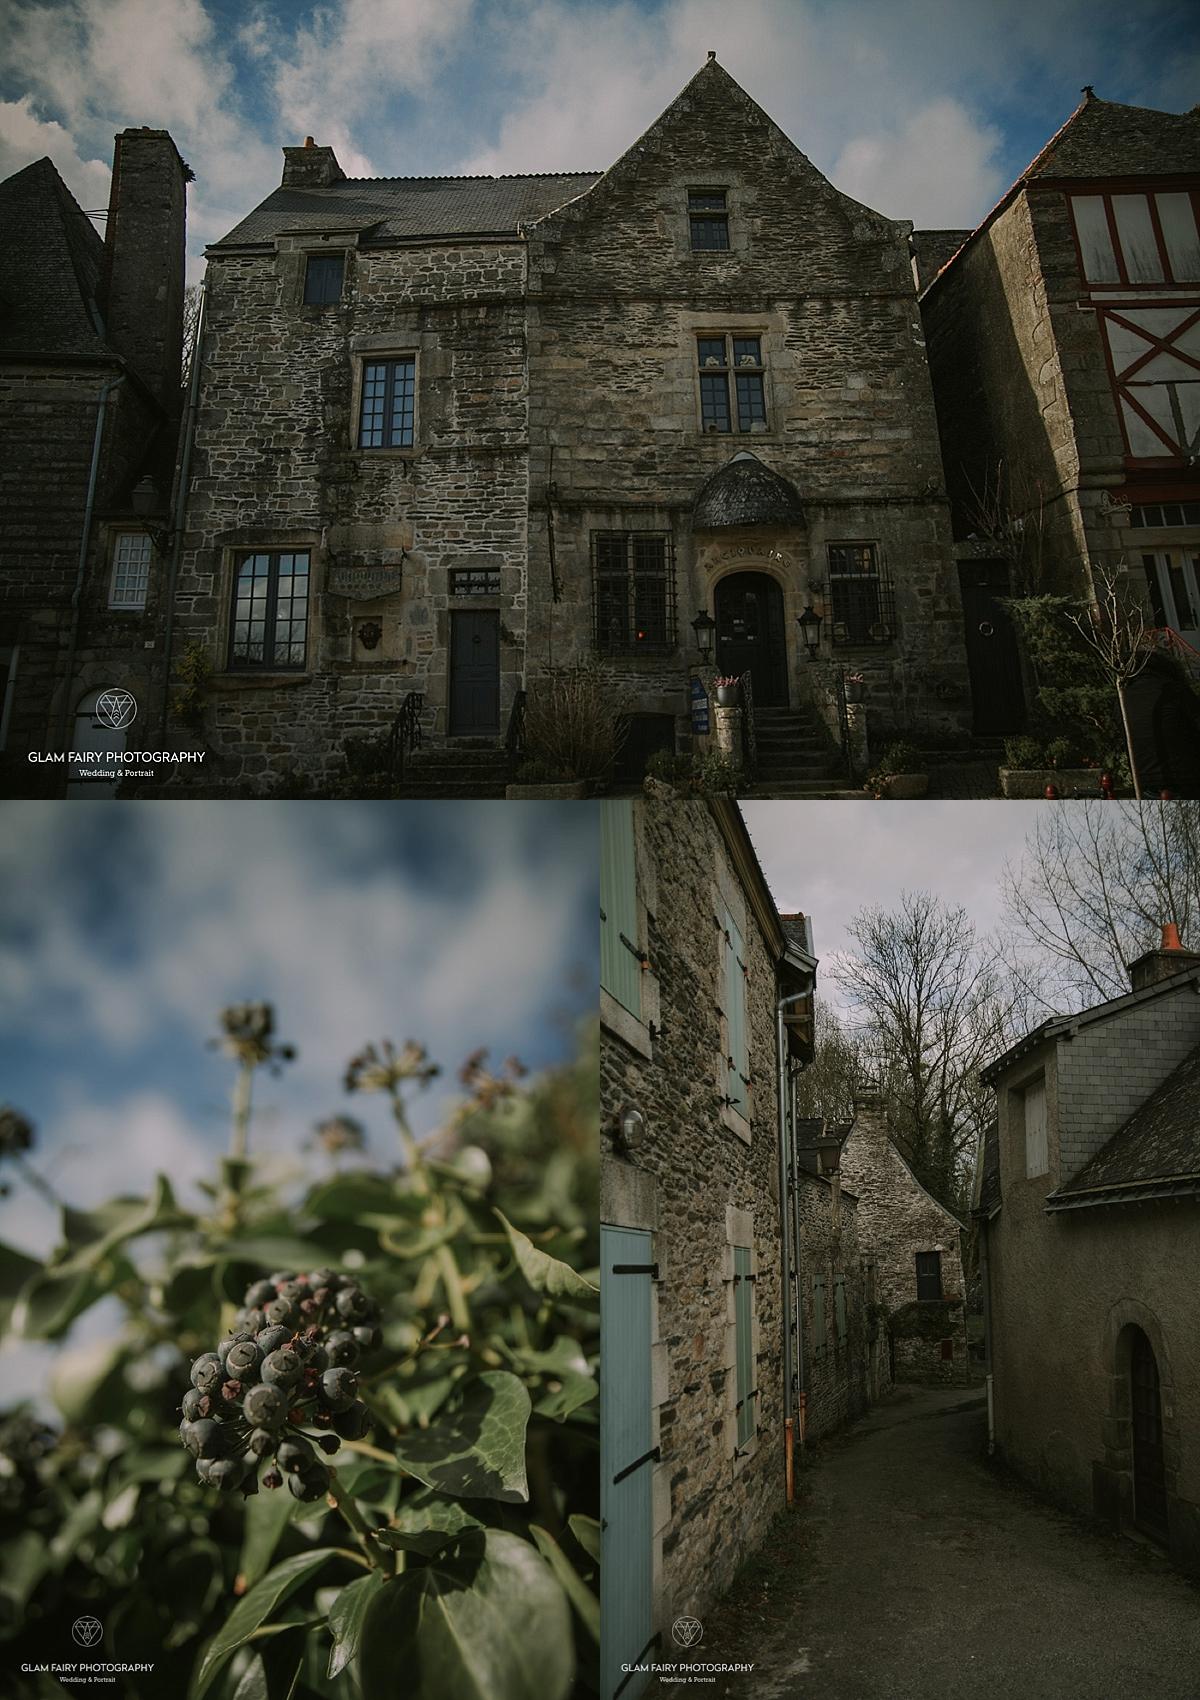 GlamFairyPhotography-souvenir-de-bretagne-travel_0003